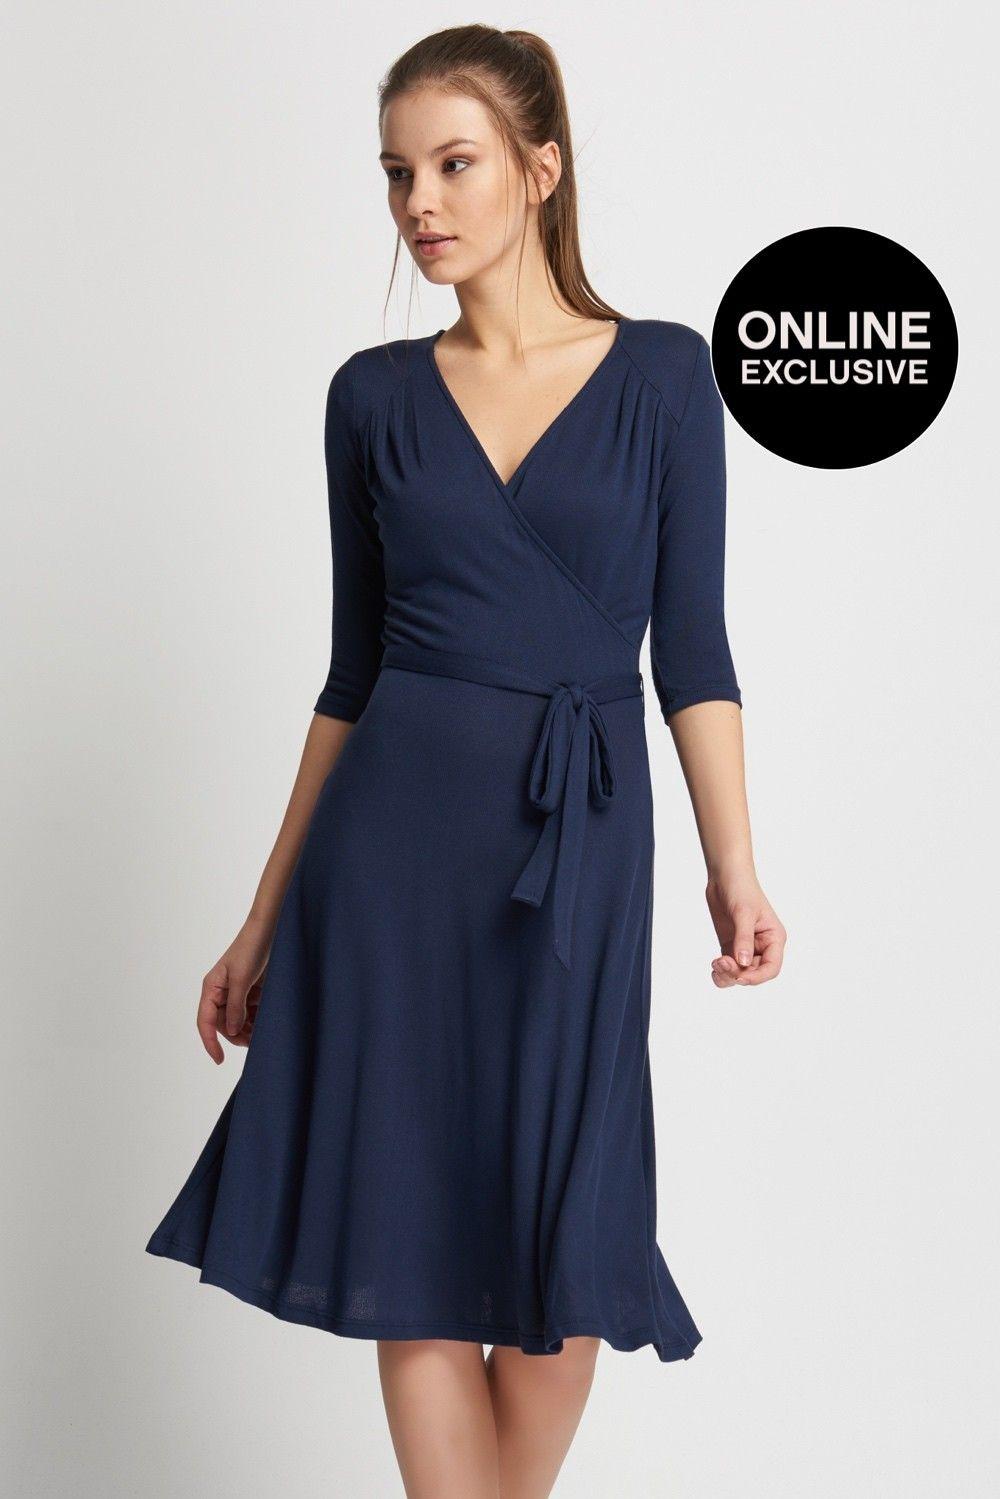 Wickel-Kleid mit Taillenriemen  ORSAY  Wickelkleid, Kleider